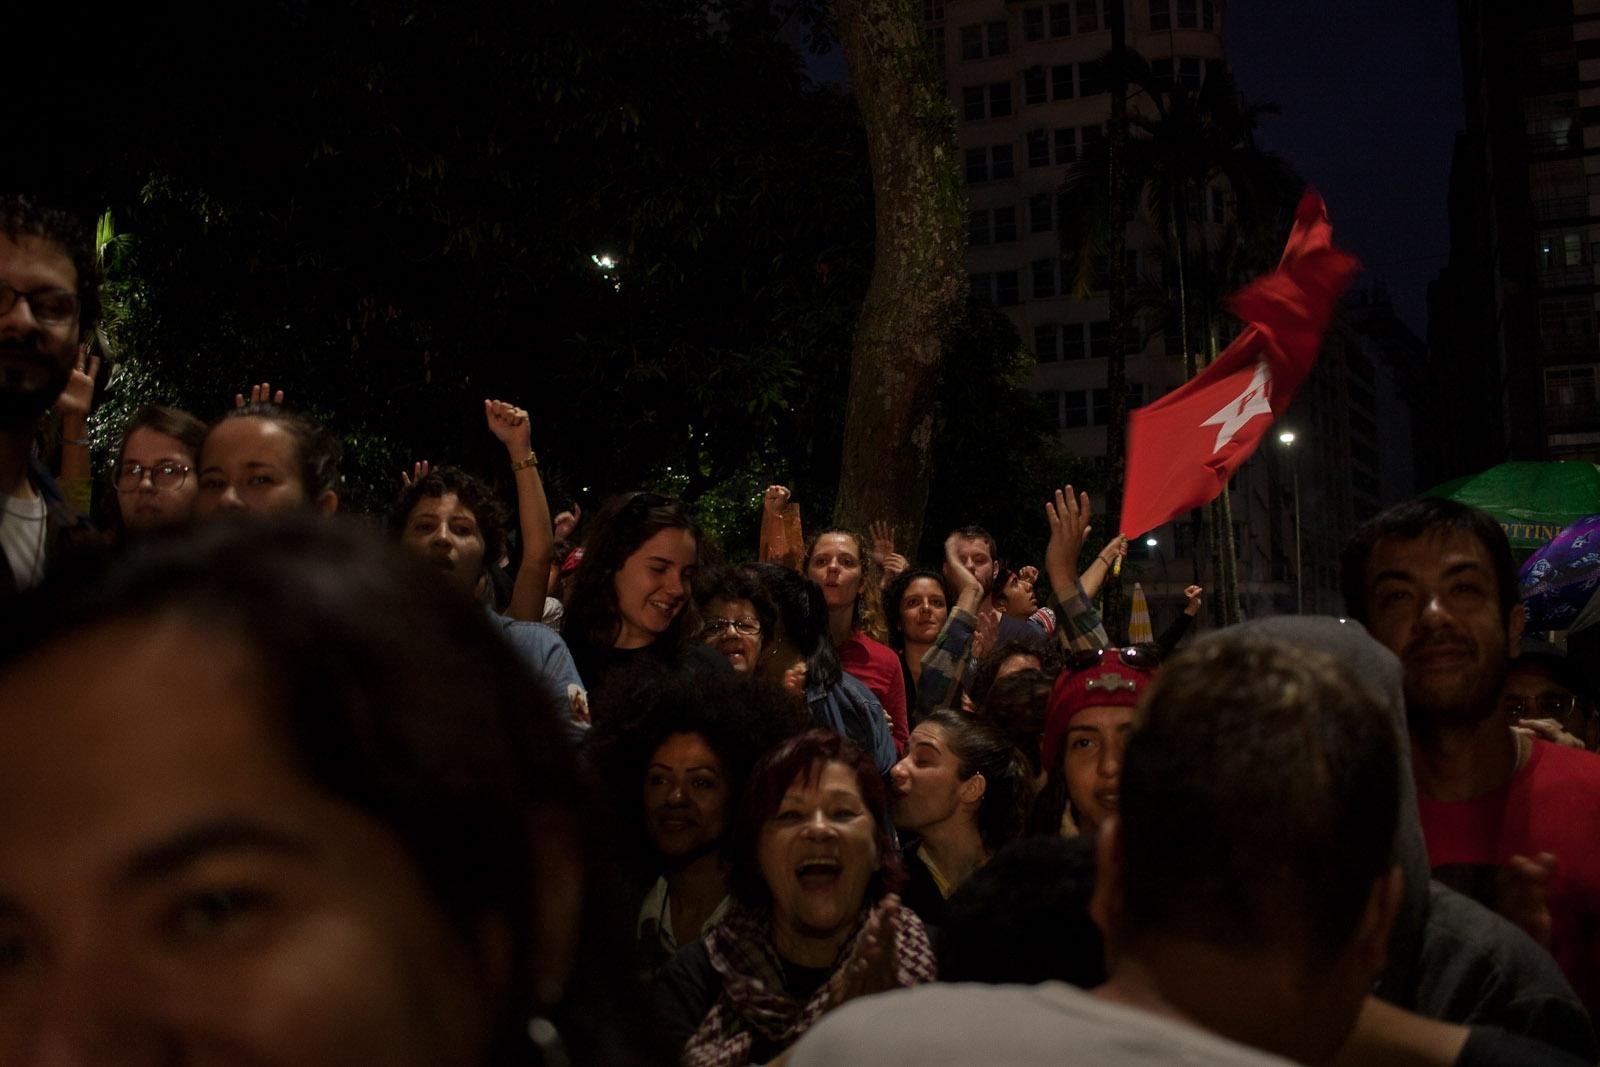 Manifestantes pedem Lula Livre / Protesters claim Free Lula